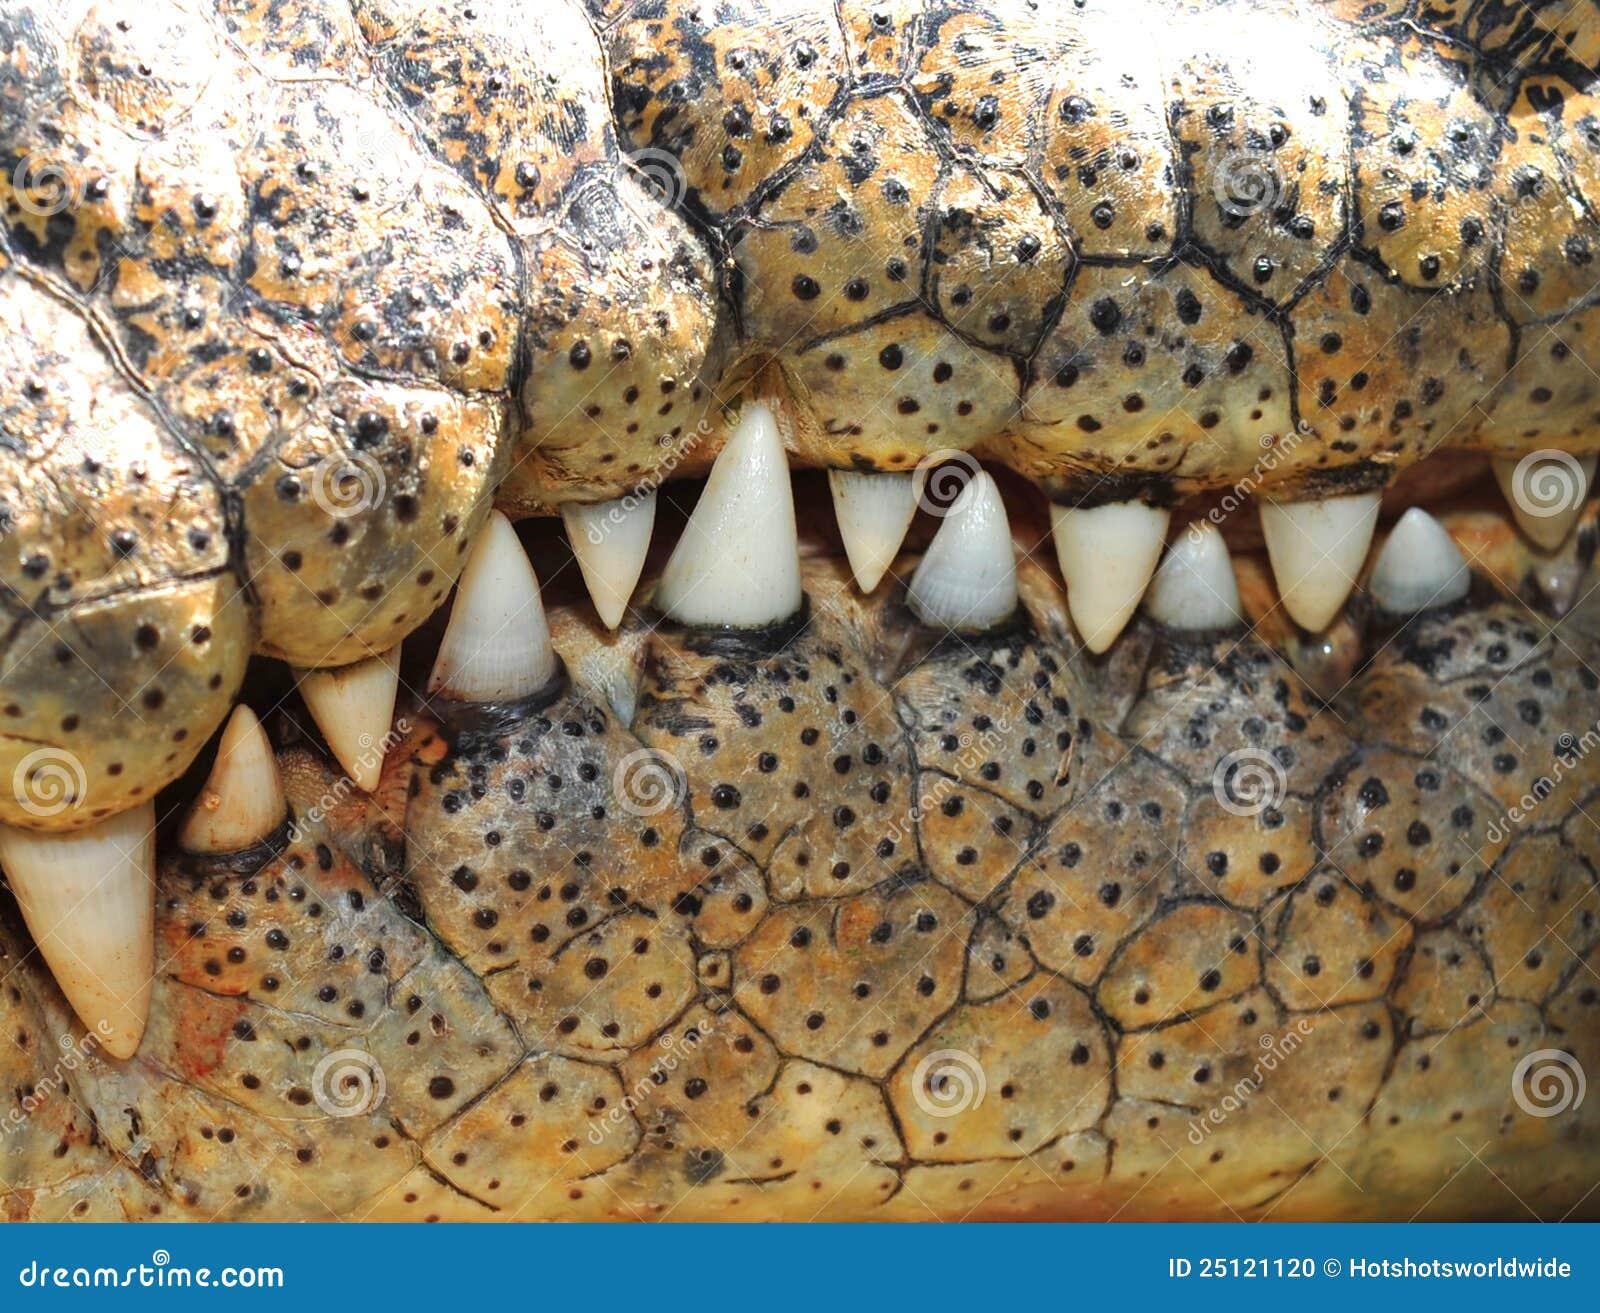 Dientes del cocodrilo del agua salada, Queensland, Australia